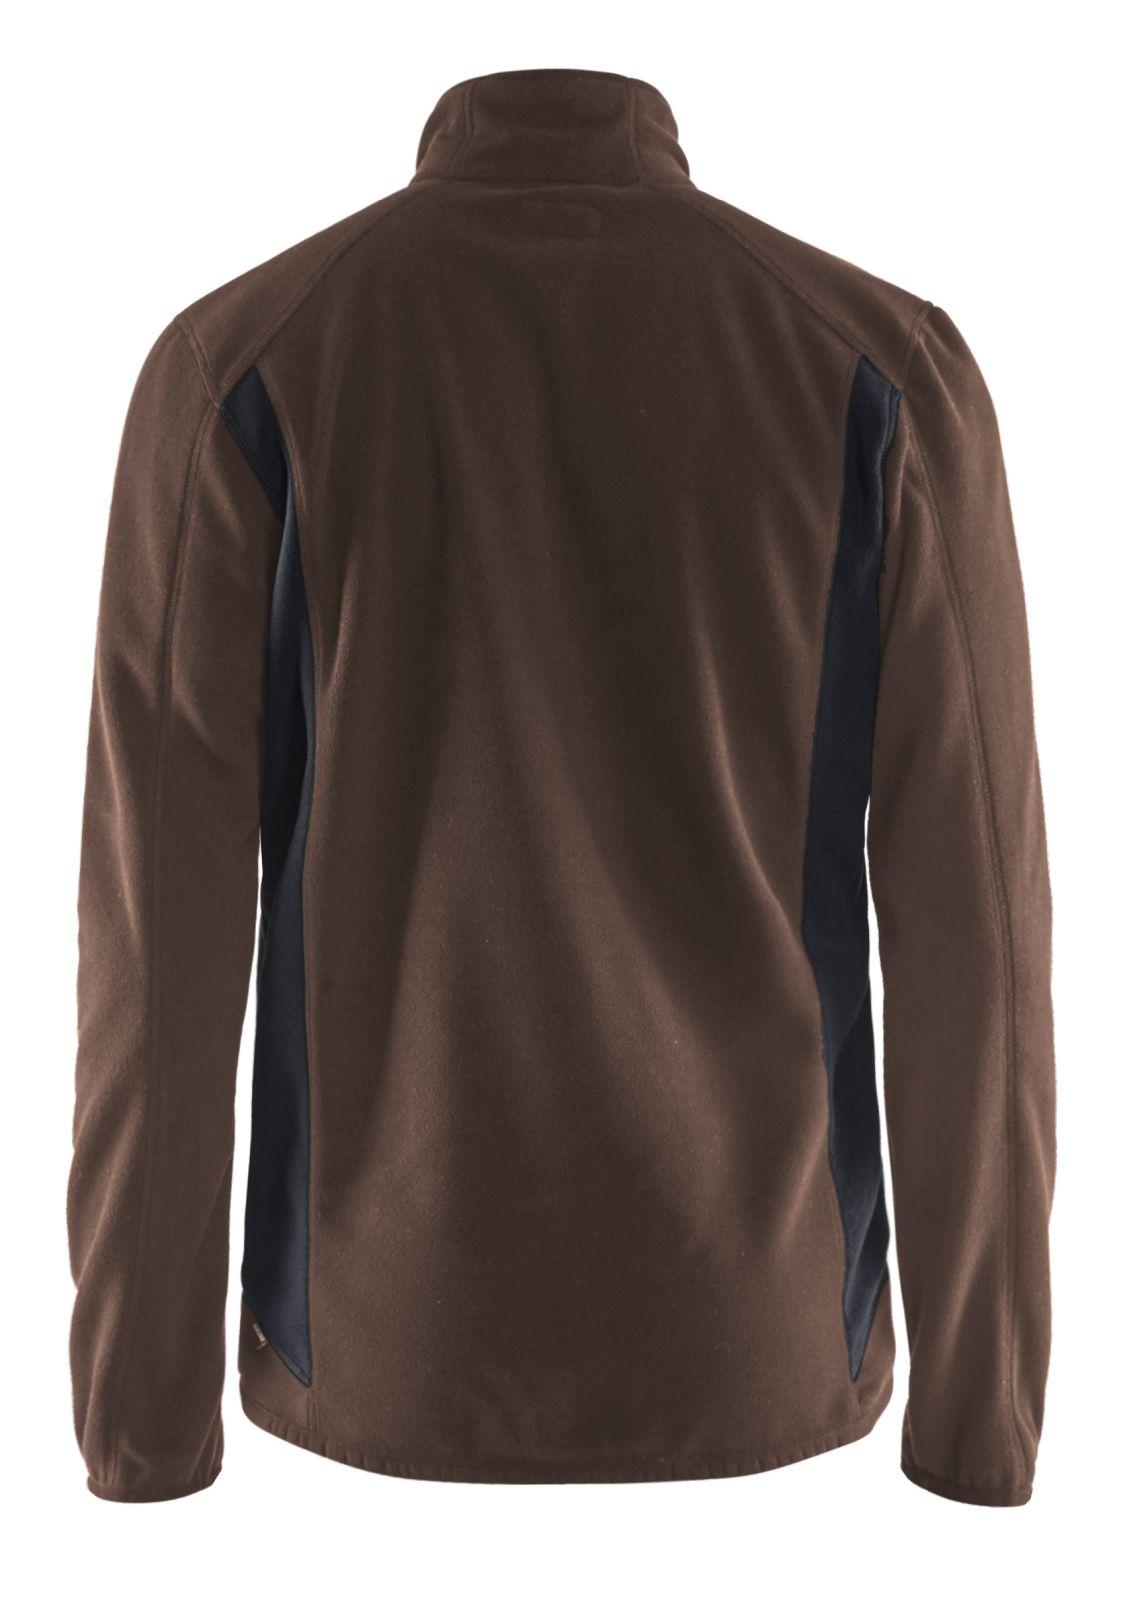 Blaklader Fleece vesten 47302510 bruin-zwart(7899)